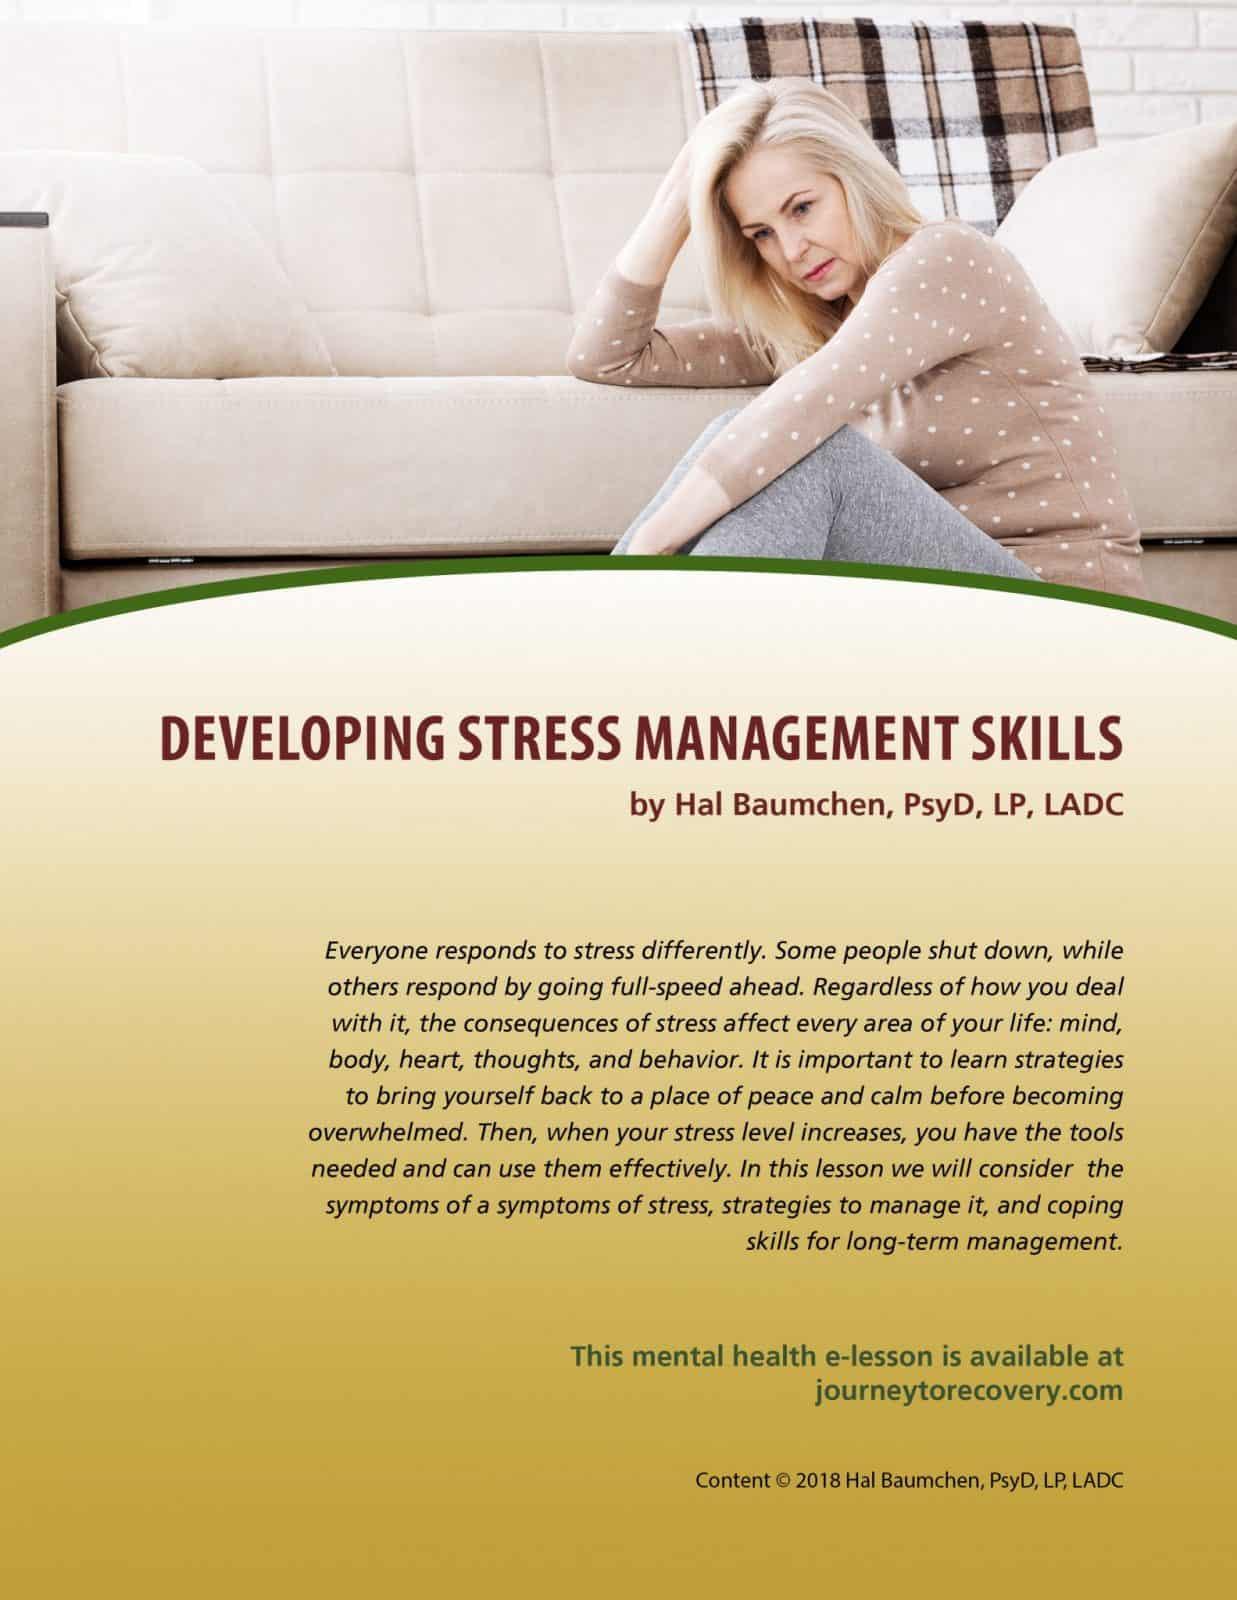 Developing Stress Management Skills (MH Lesson)